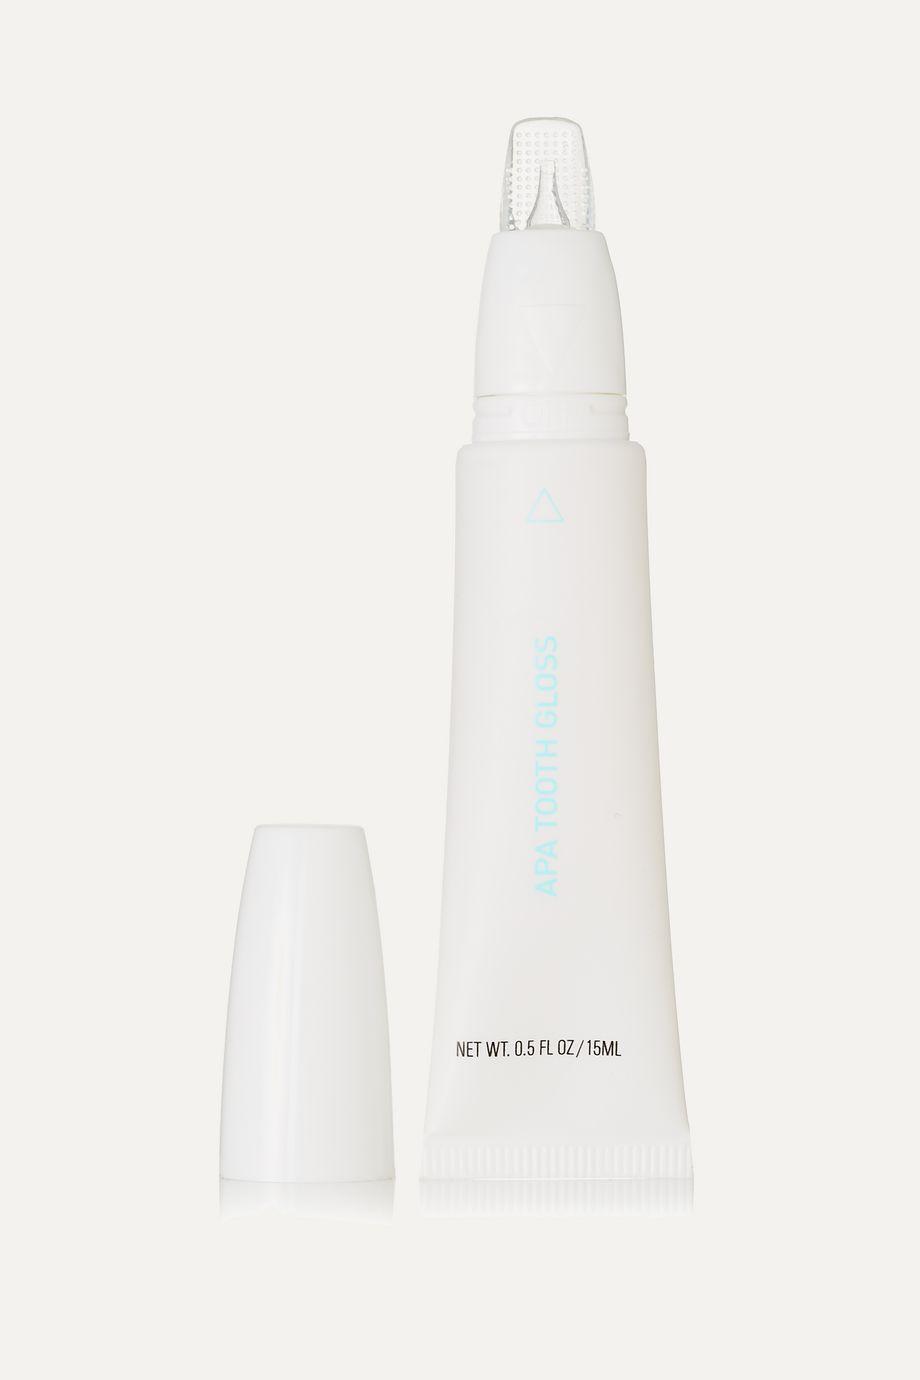 Apa Beauty Tooth Gloss, 15ml